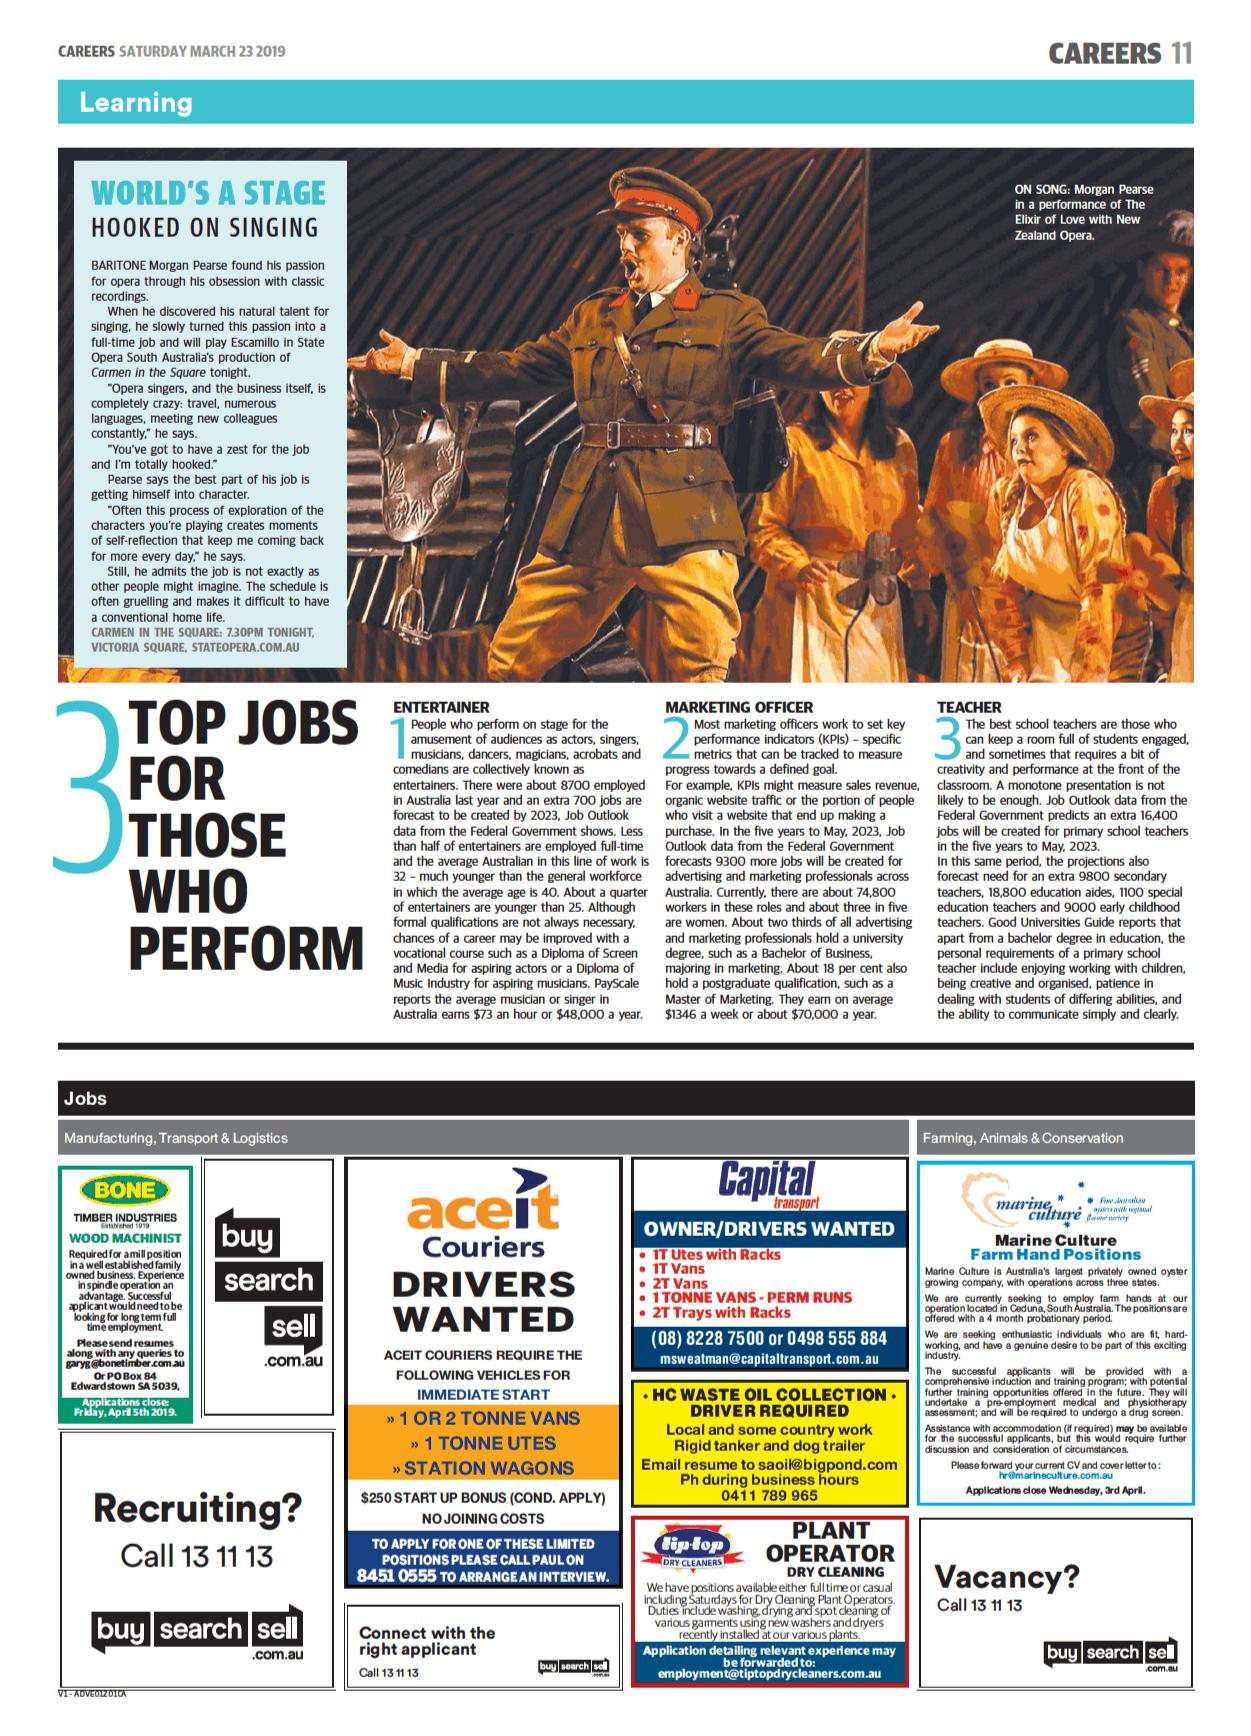 State Opera - Morgan Pearse (Careers 1).png